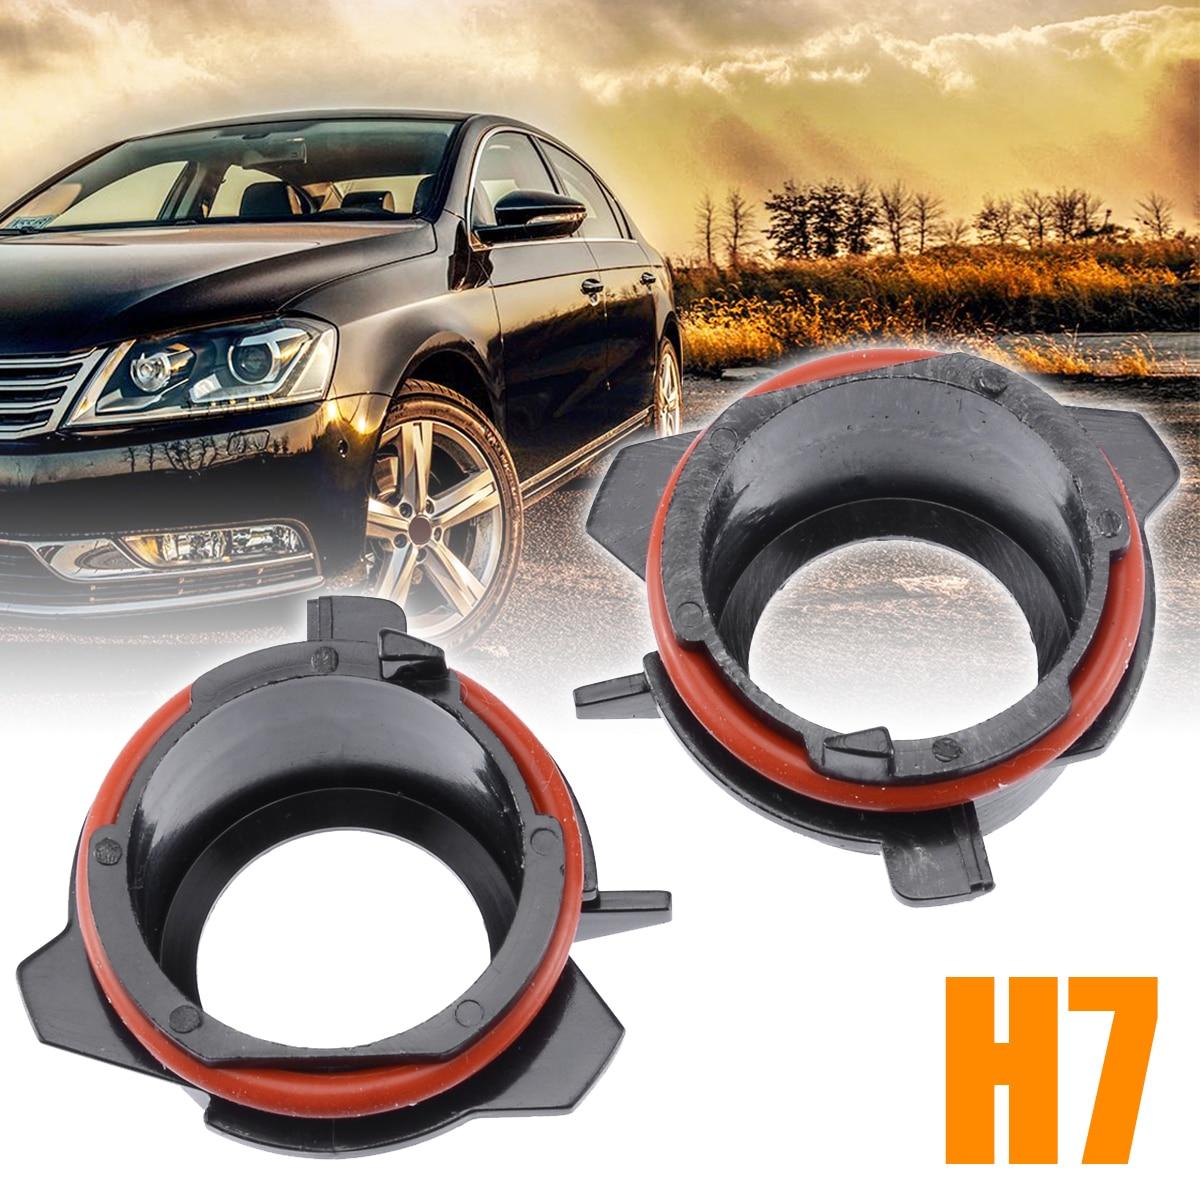 2pcs H7 Car Headlight Lamp HID XENON Bulb Adapter Holder Conversion Adapter Base For BMW E39 5 Series 1997-2003